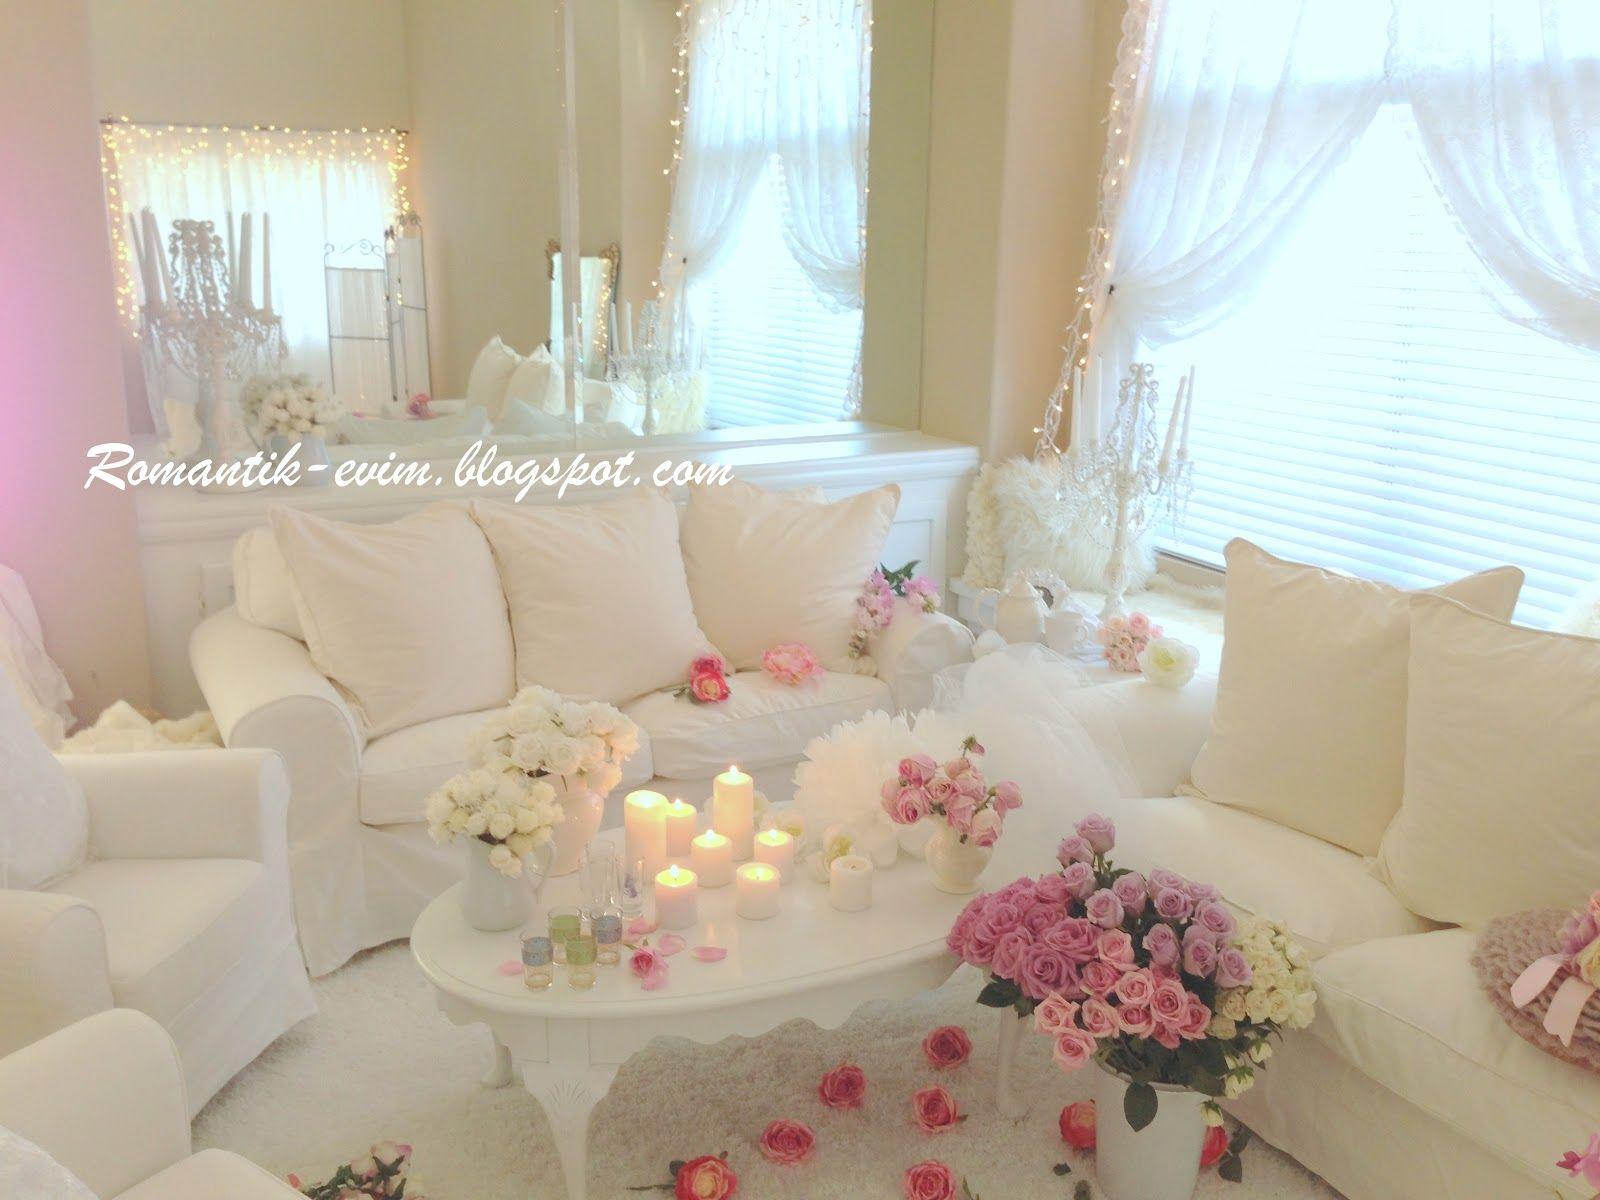 Shabby Chic Romantic Home Decor | My Shabby Chic Home ~ Romantik Evim: Shabby  Chic